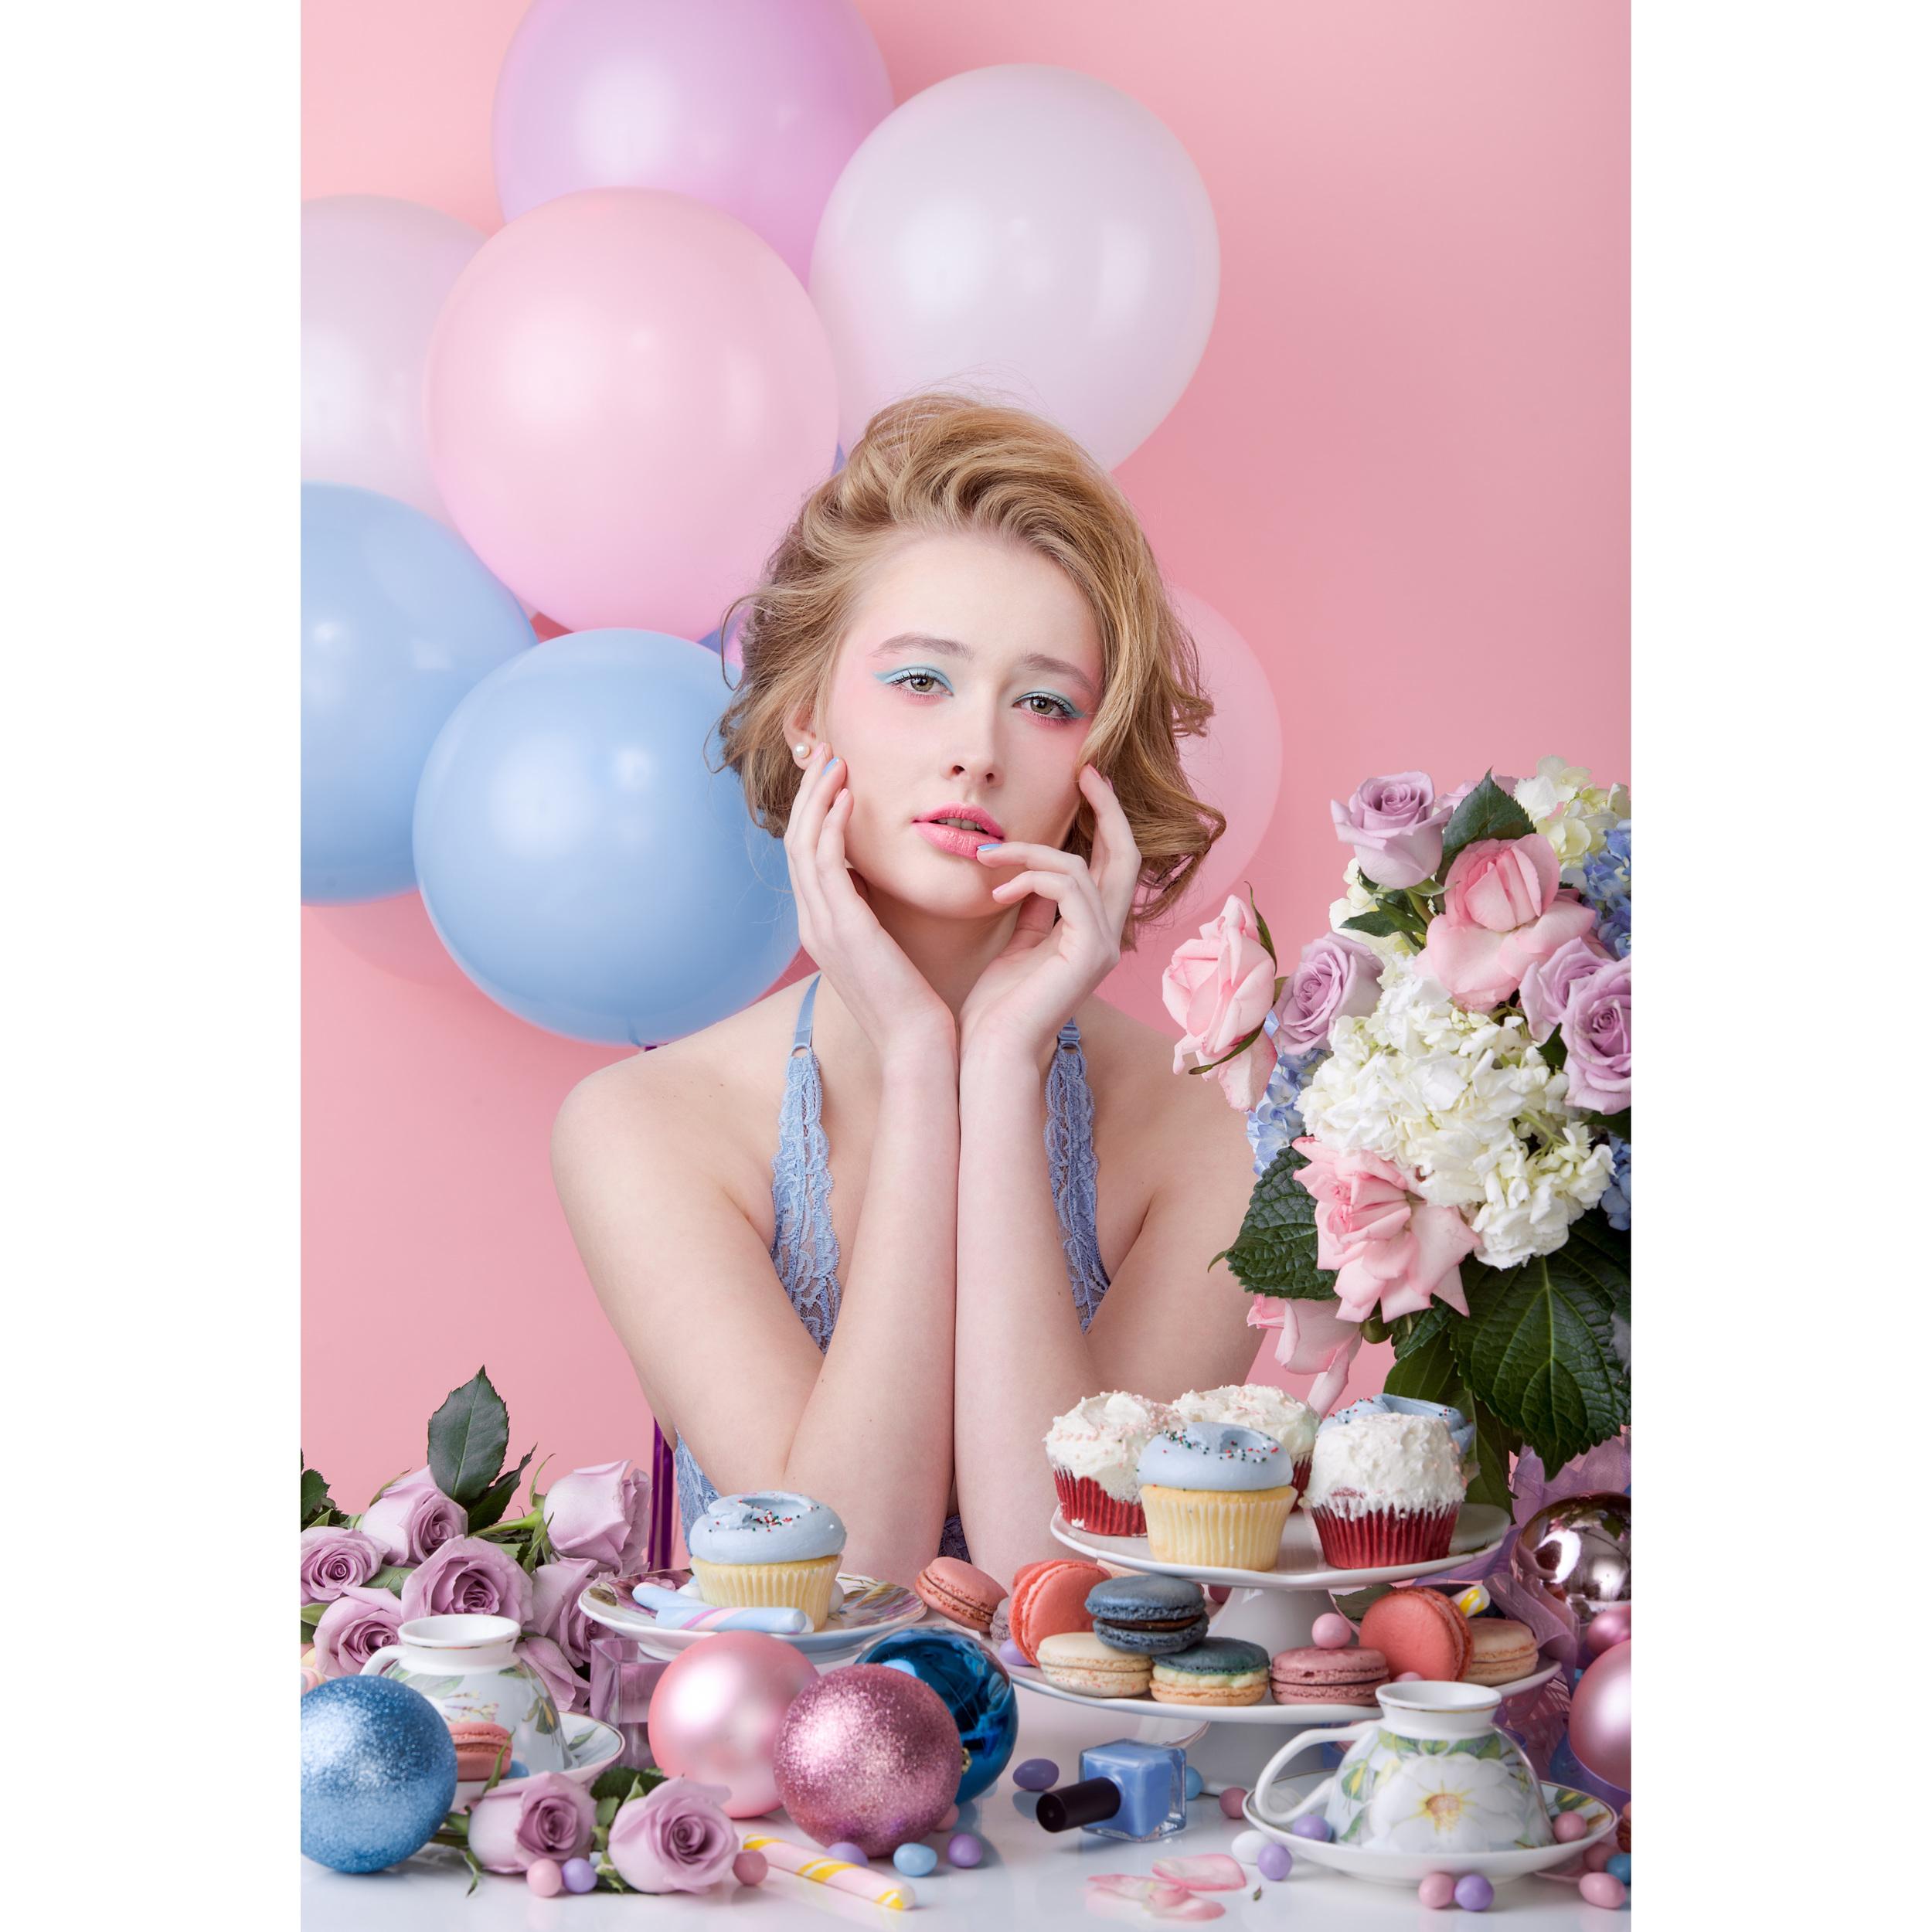 Candy DreamC151220 Maria-2750-Edit copy.jpg